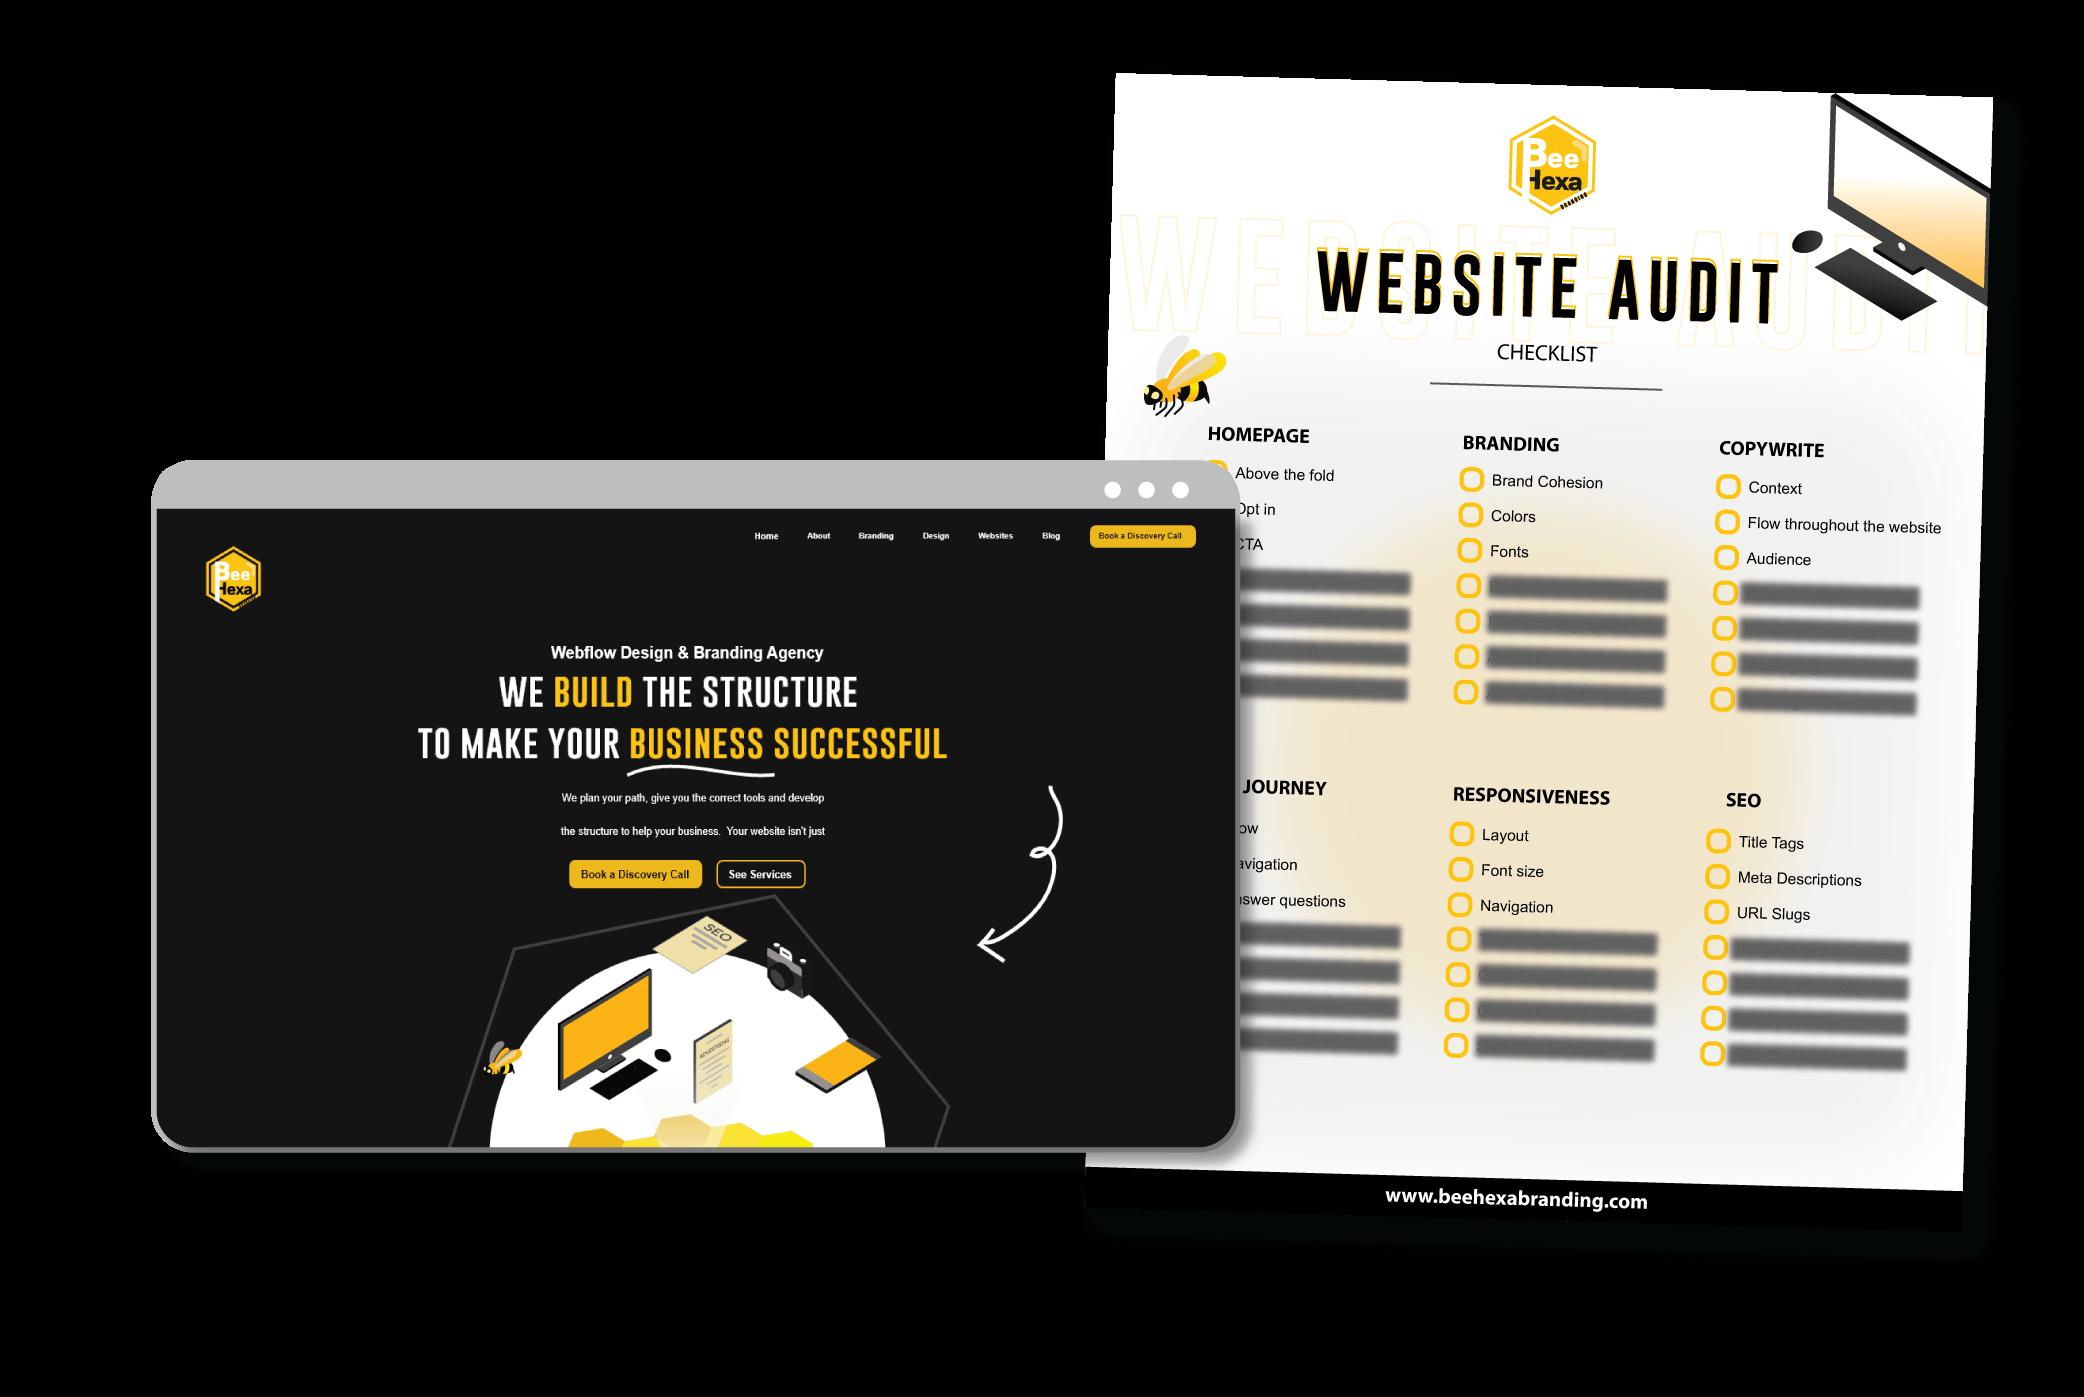 Website with a website audit checklist